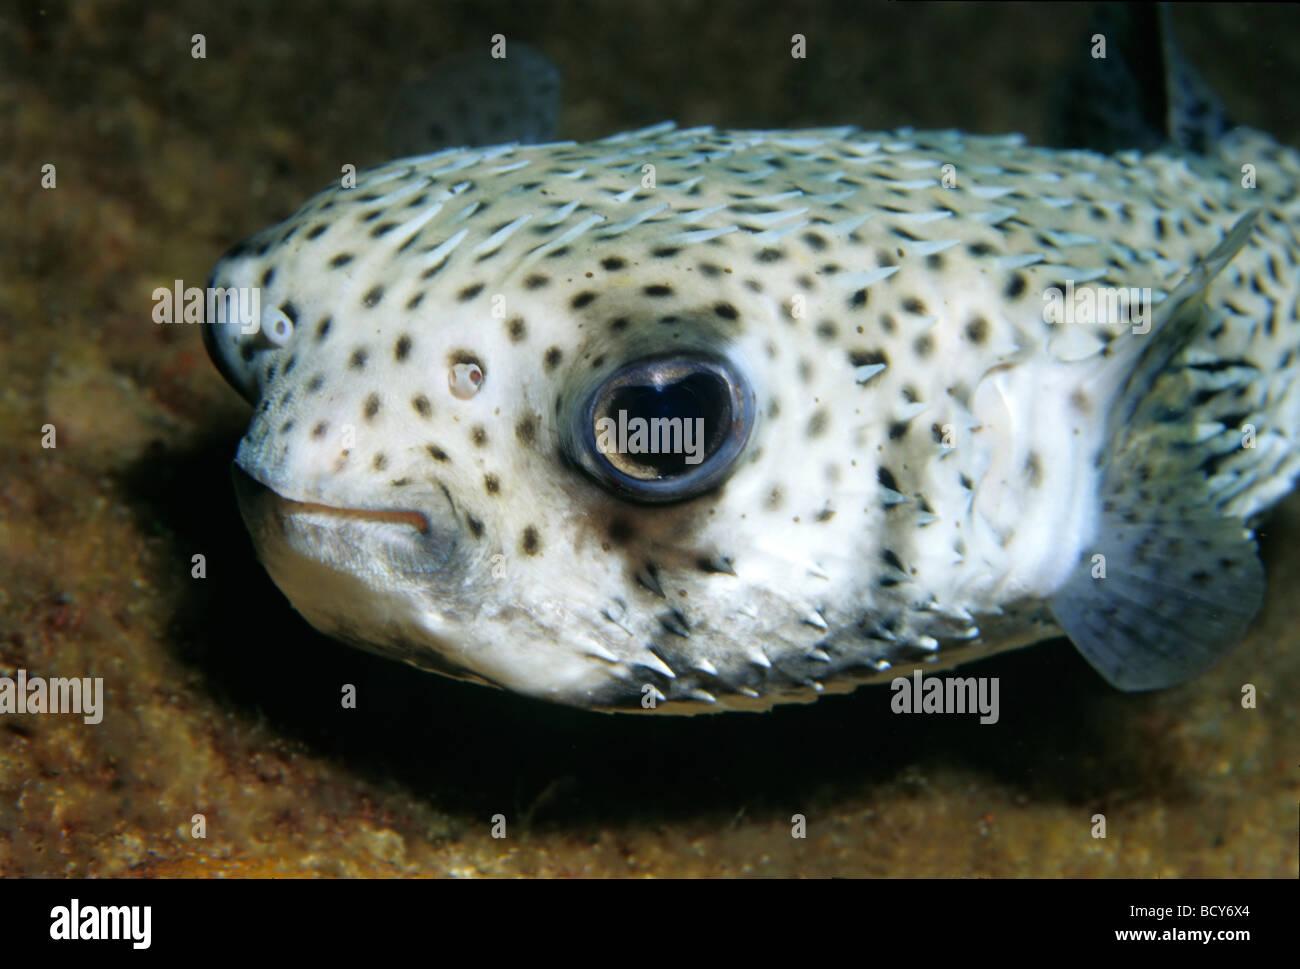 Spot-fin Porcupinefish (Diodon hystrix), fish, portrait, Similan Islands, Andaman Sea, Thailand, Asia, Indian Ocean - Stock Image